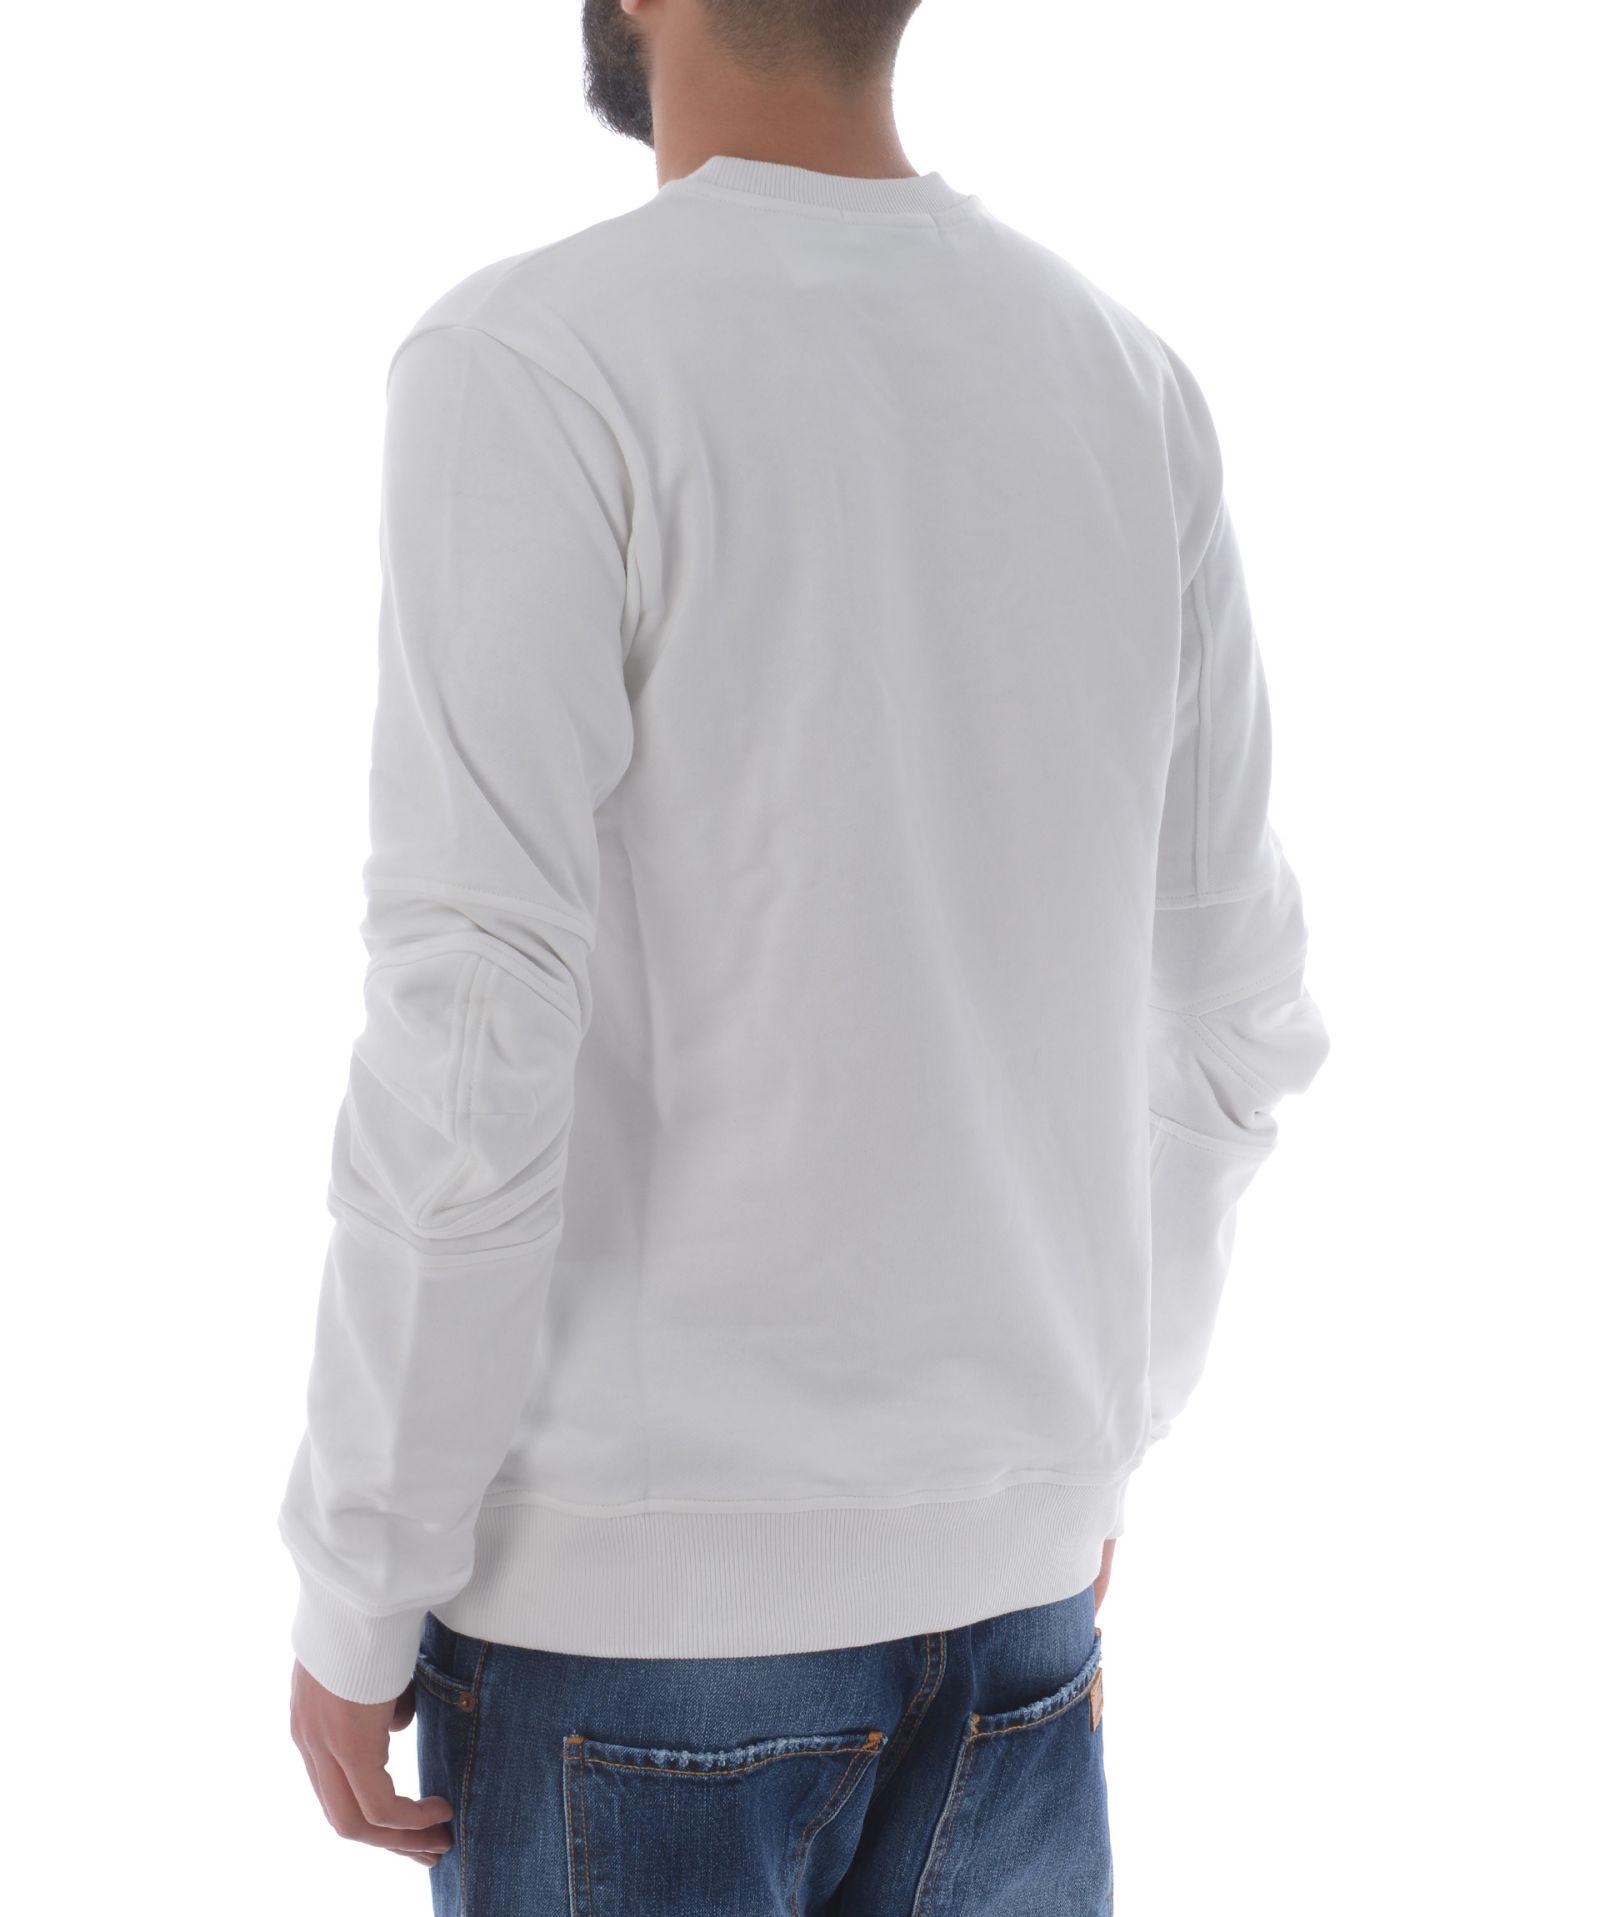 comme des gar ons comme des garcons classic sweatshirt bianco latte 10598275 italist. Black Bedroom Furniture Sets. Home Design Ideas